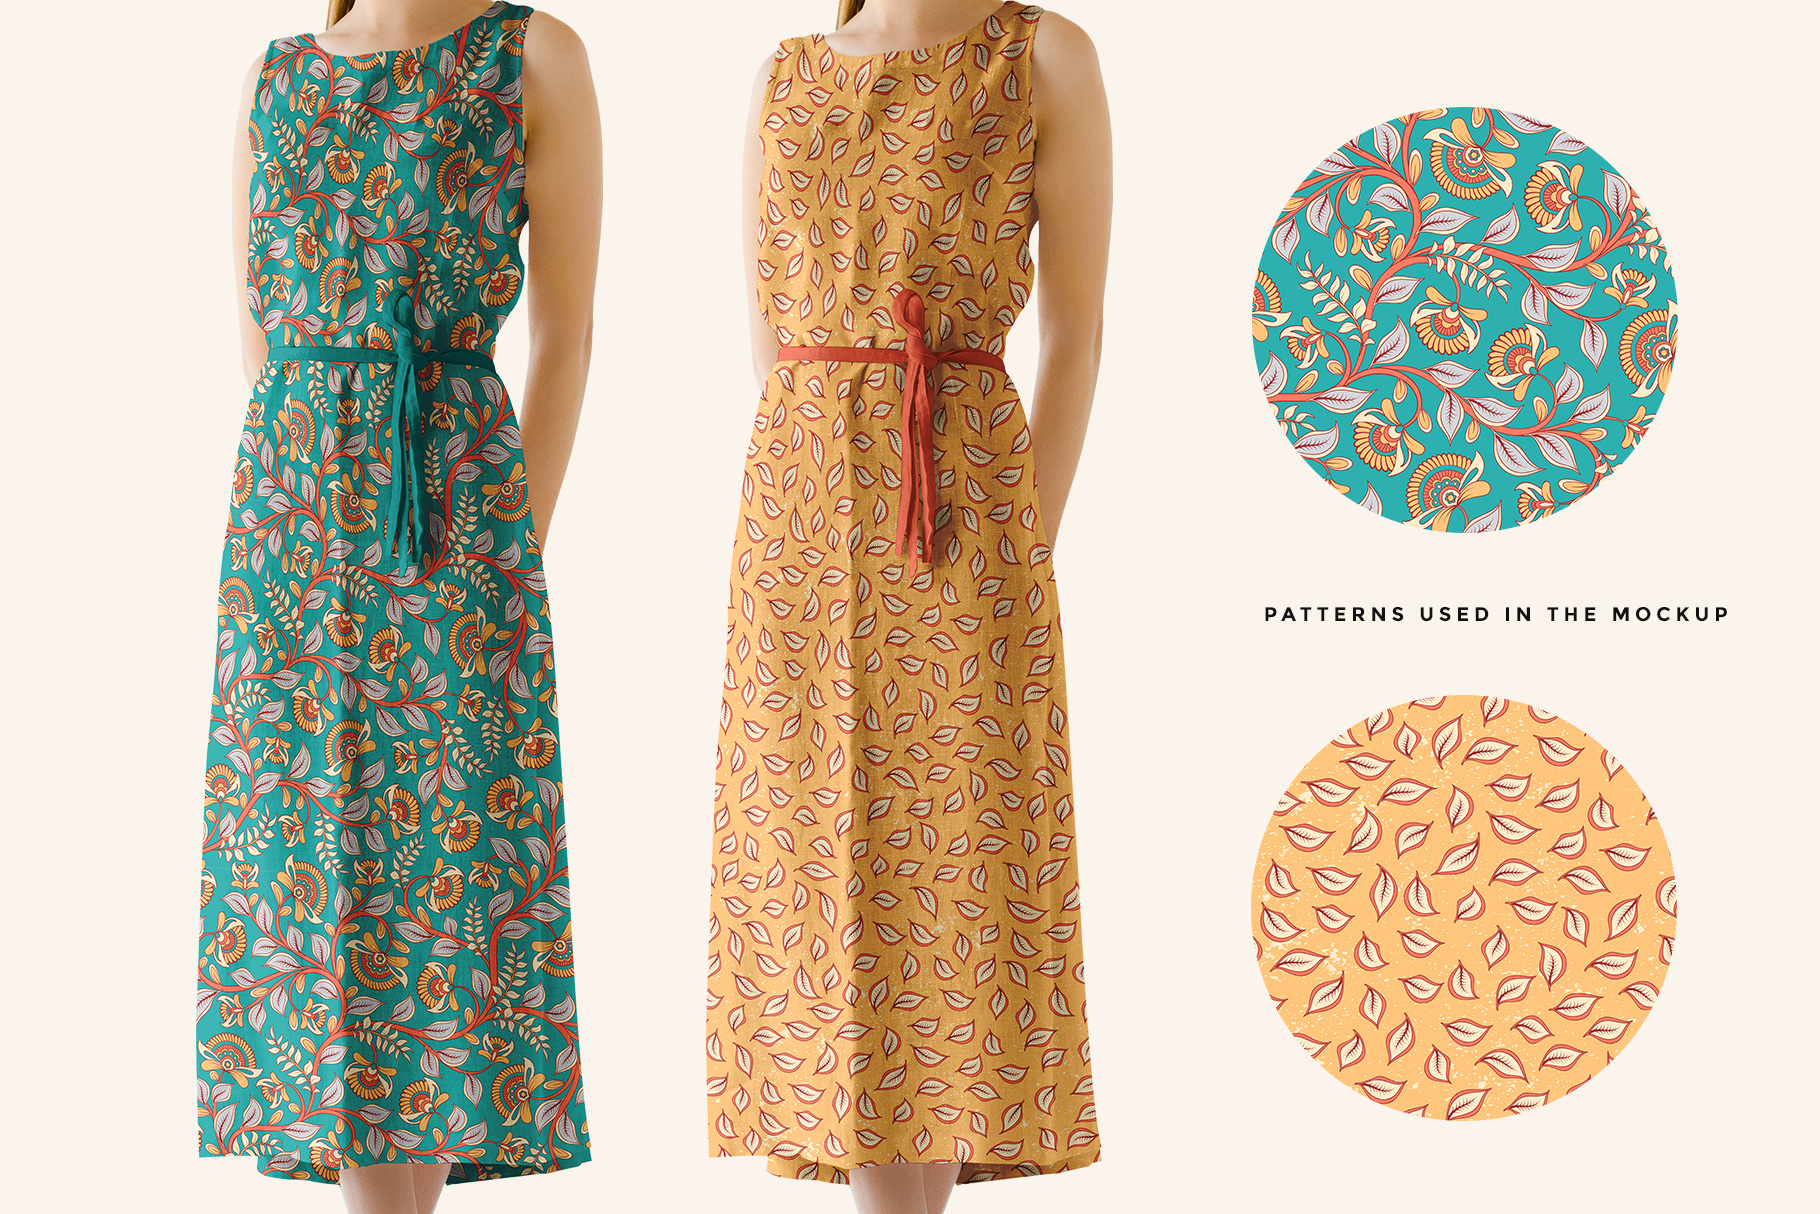 patterns used in women's sleeveless summer dress mockup